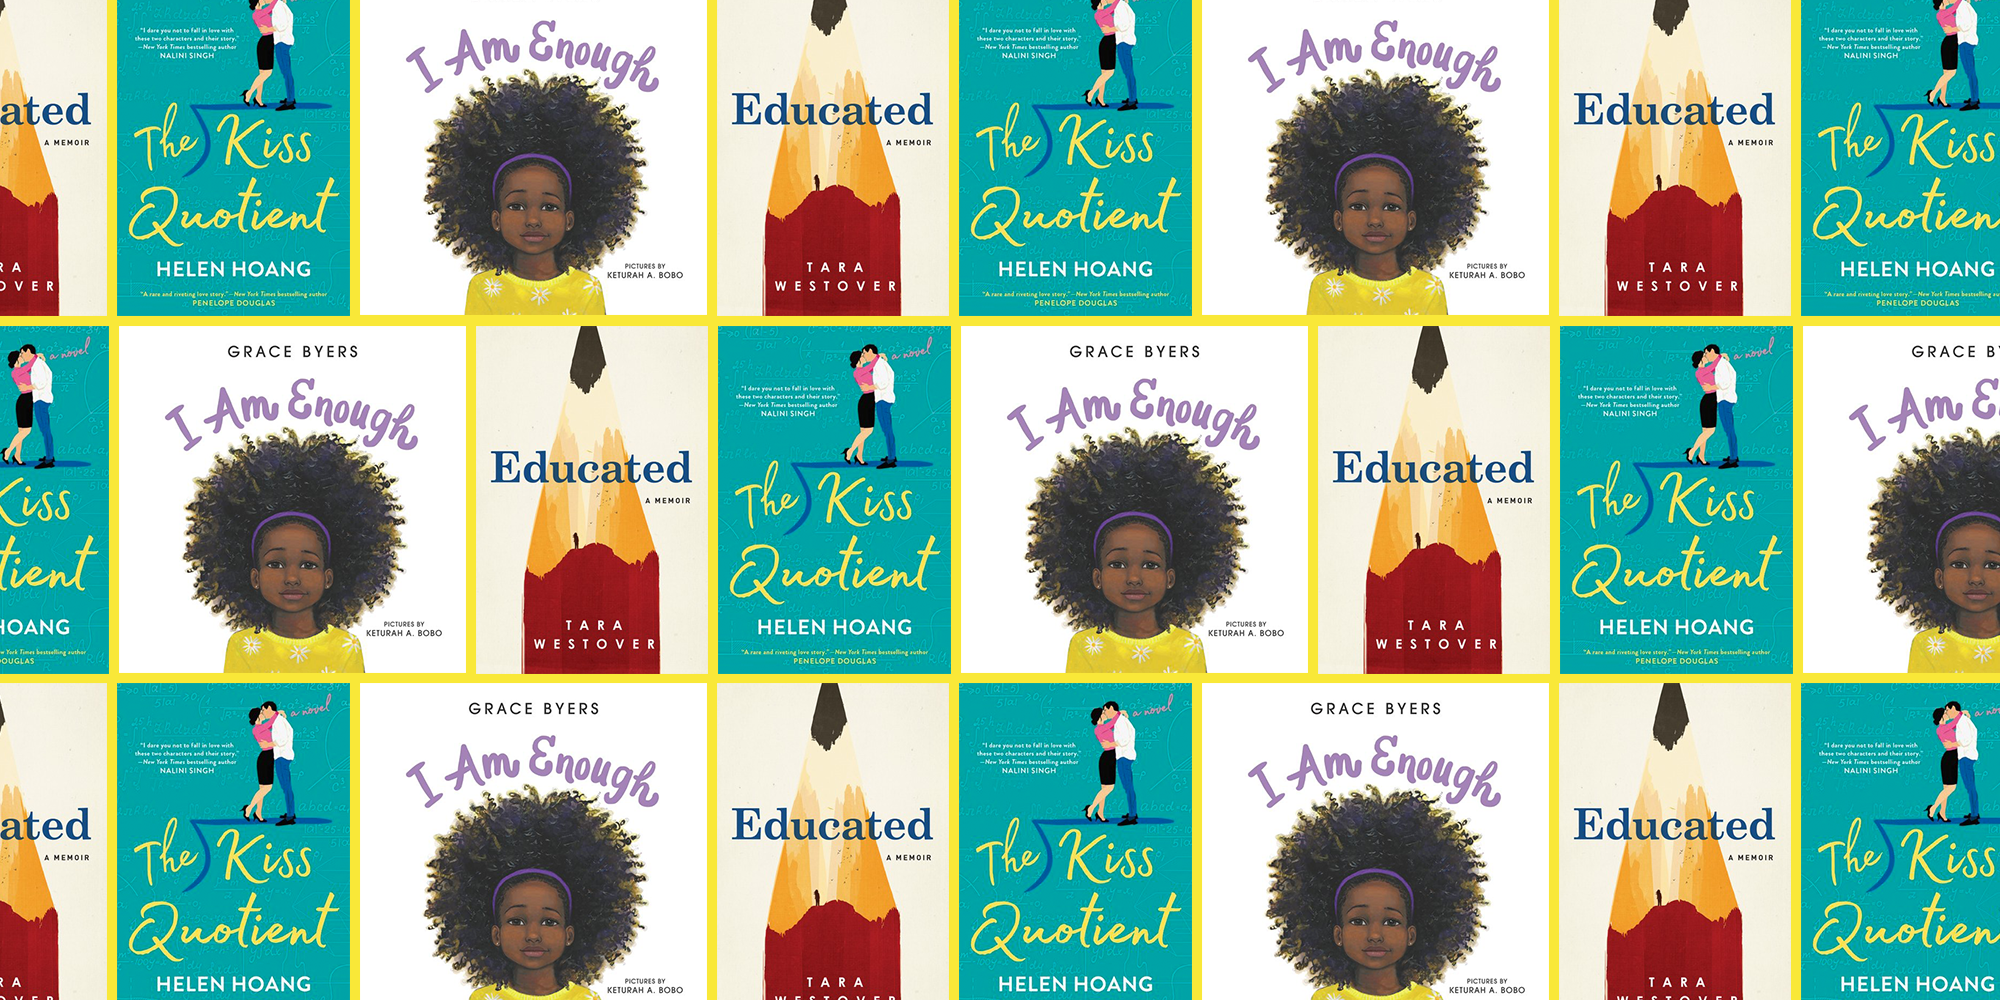 The 2018 Goodreads Best Books Winners Announced